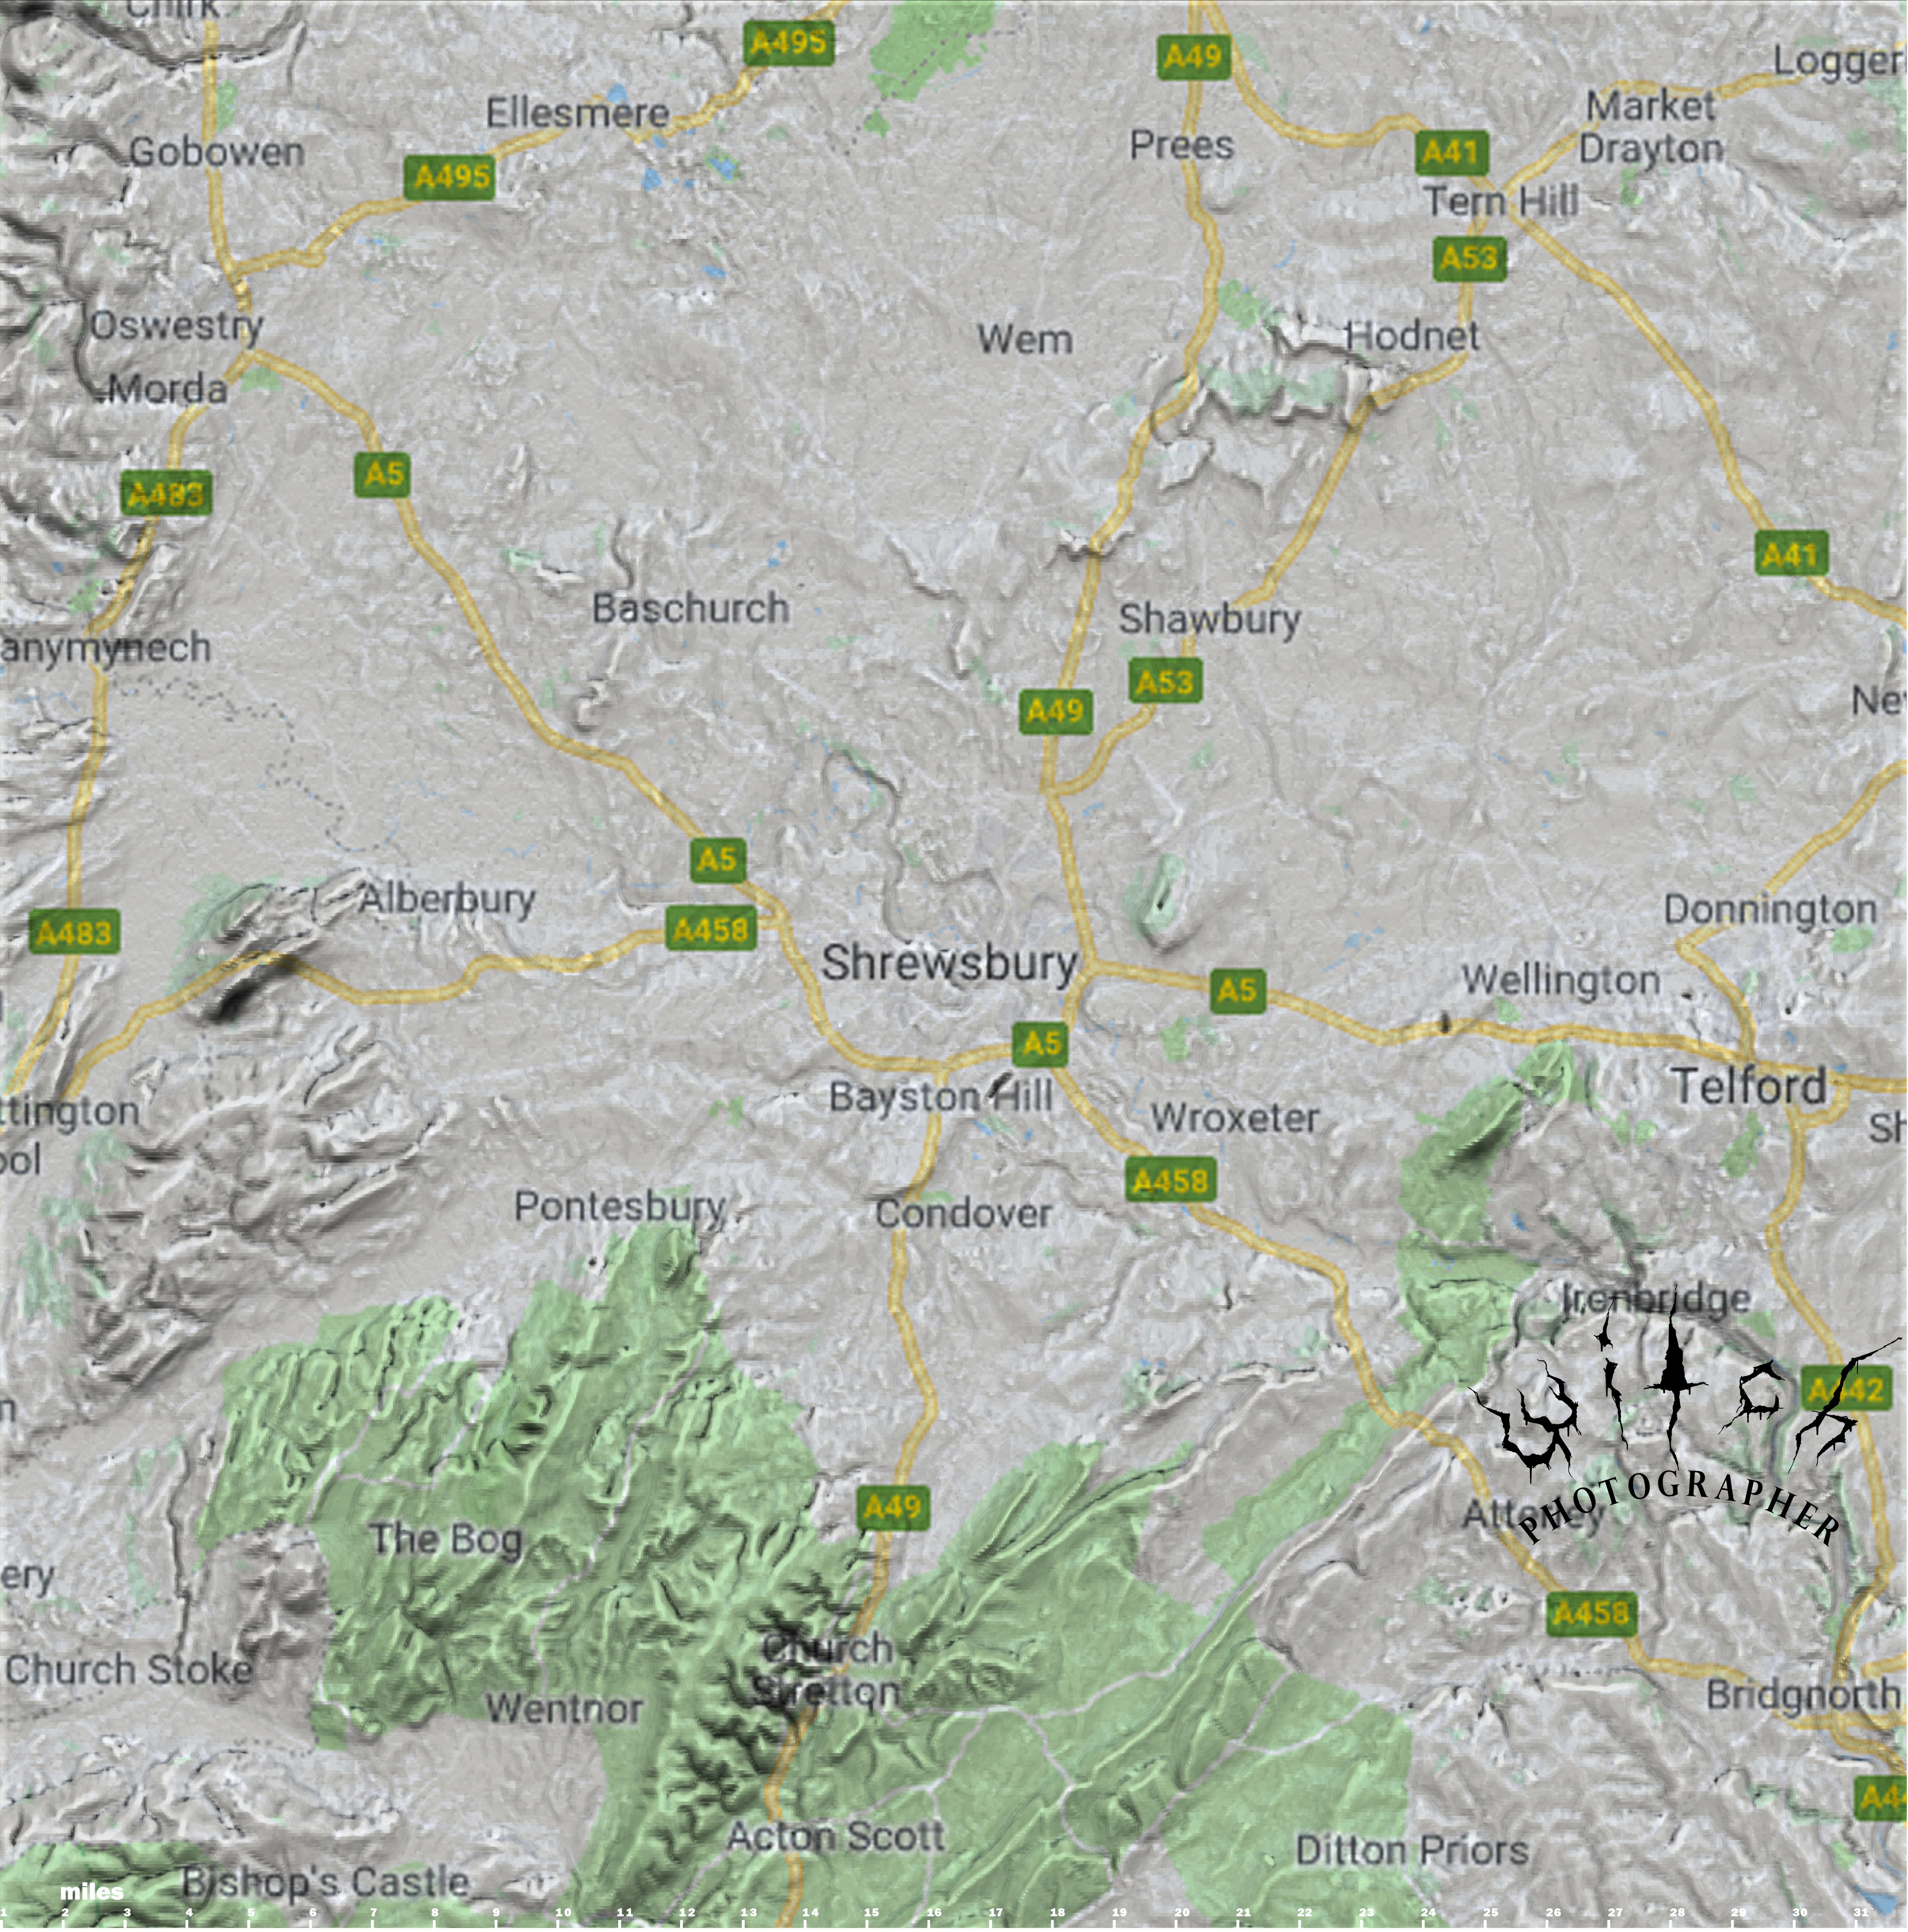 Maps - Shrewsbury